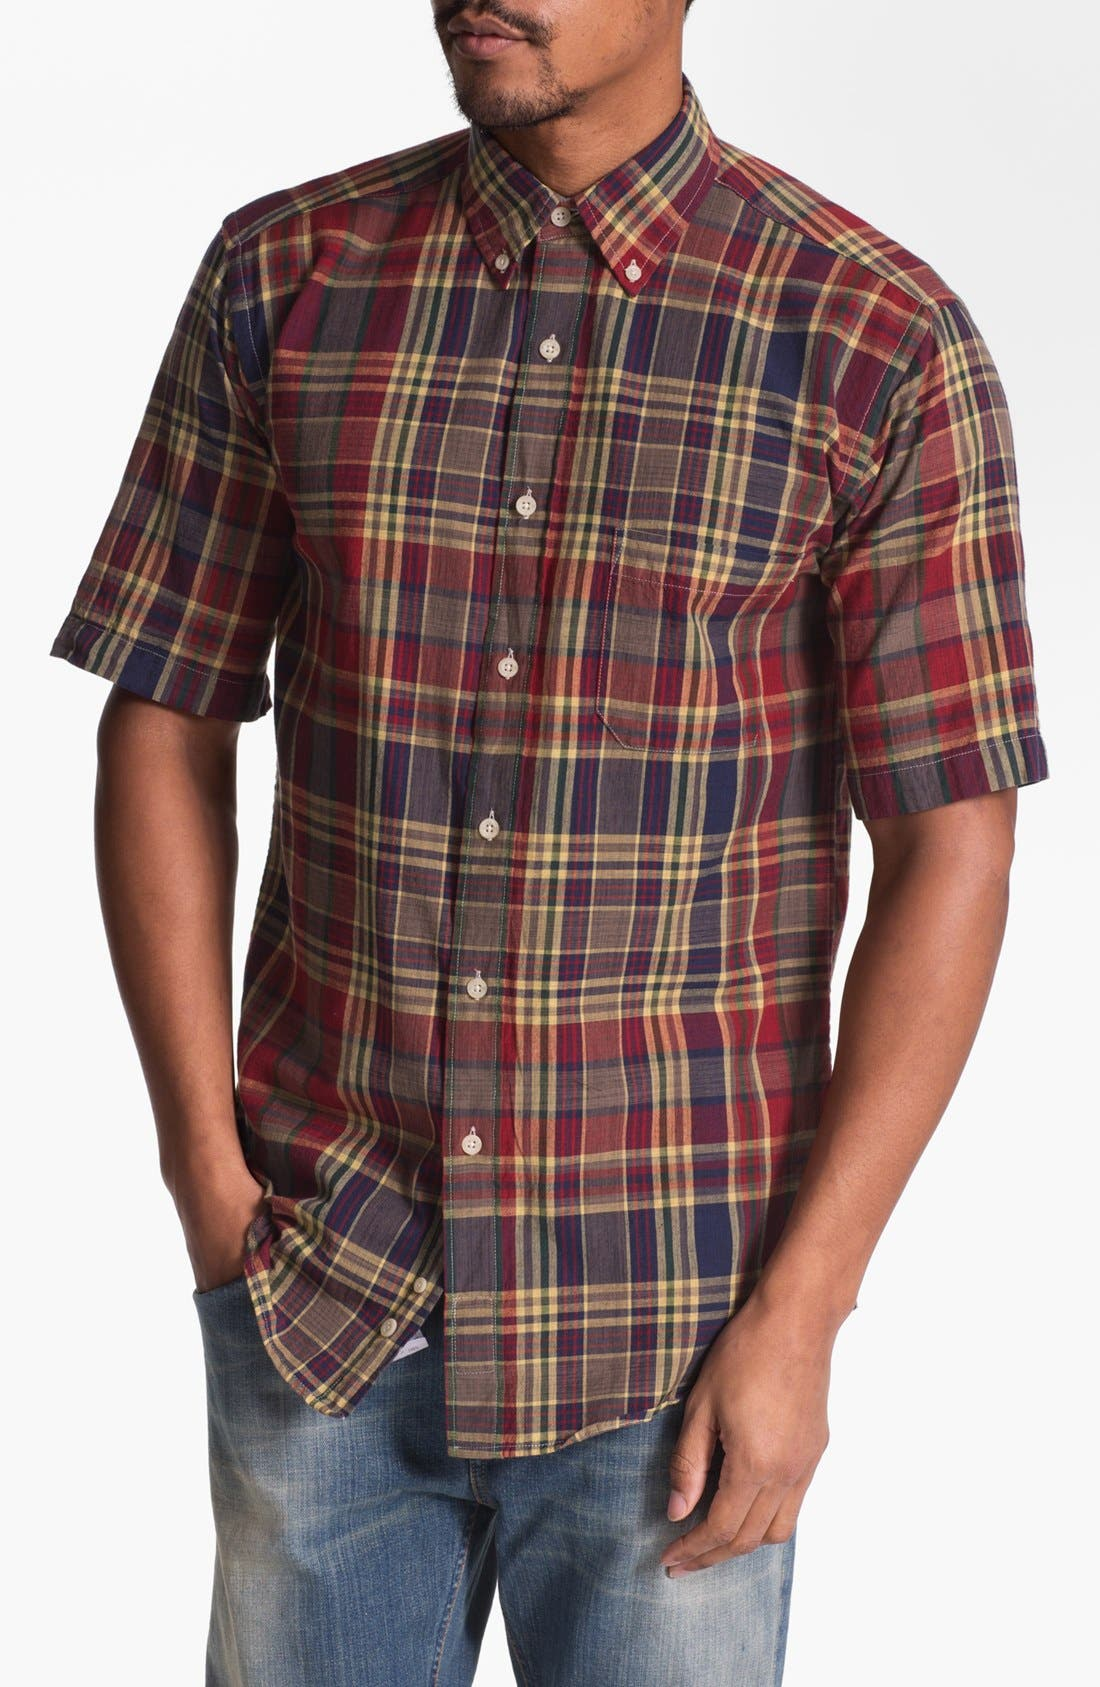 Main Image - Pendleton 'Seaside' Fitted Madras Plaid Woven Shirt